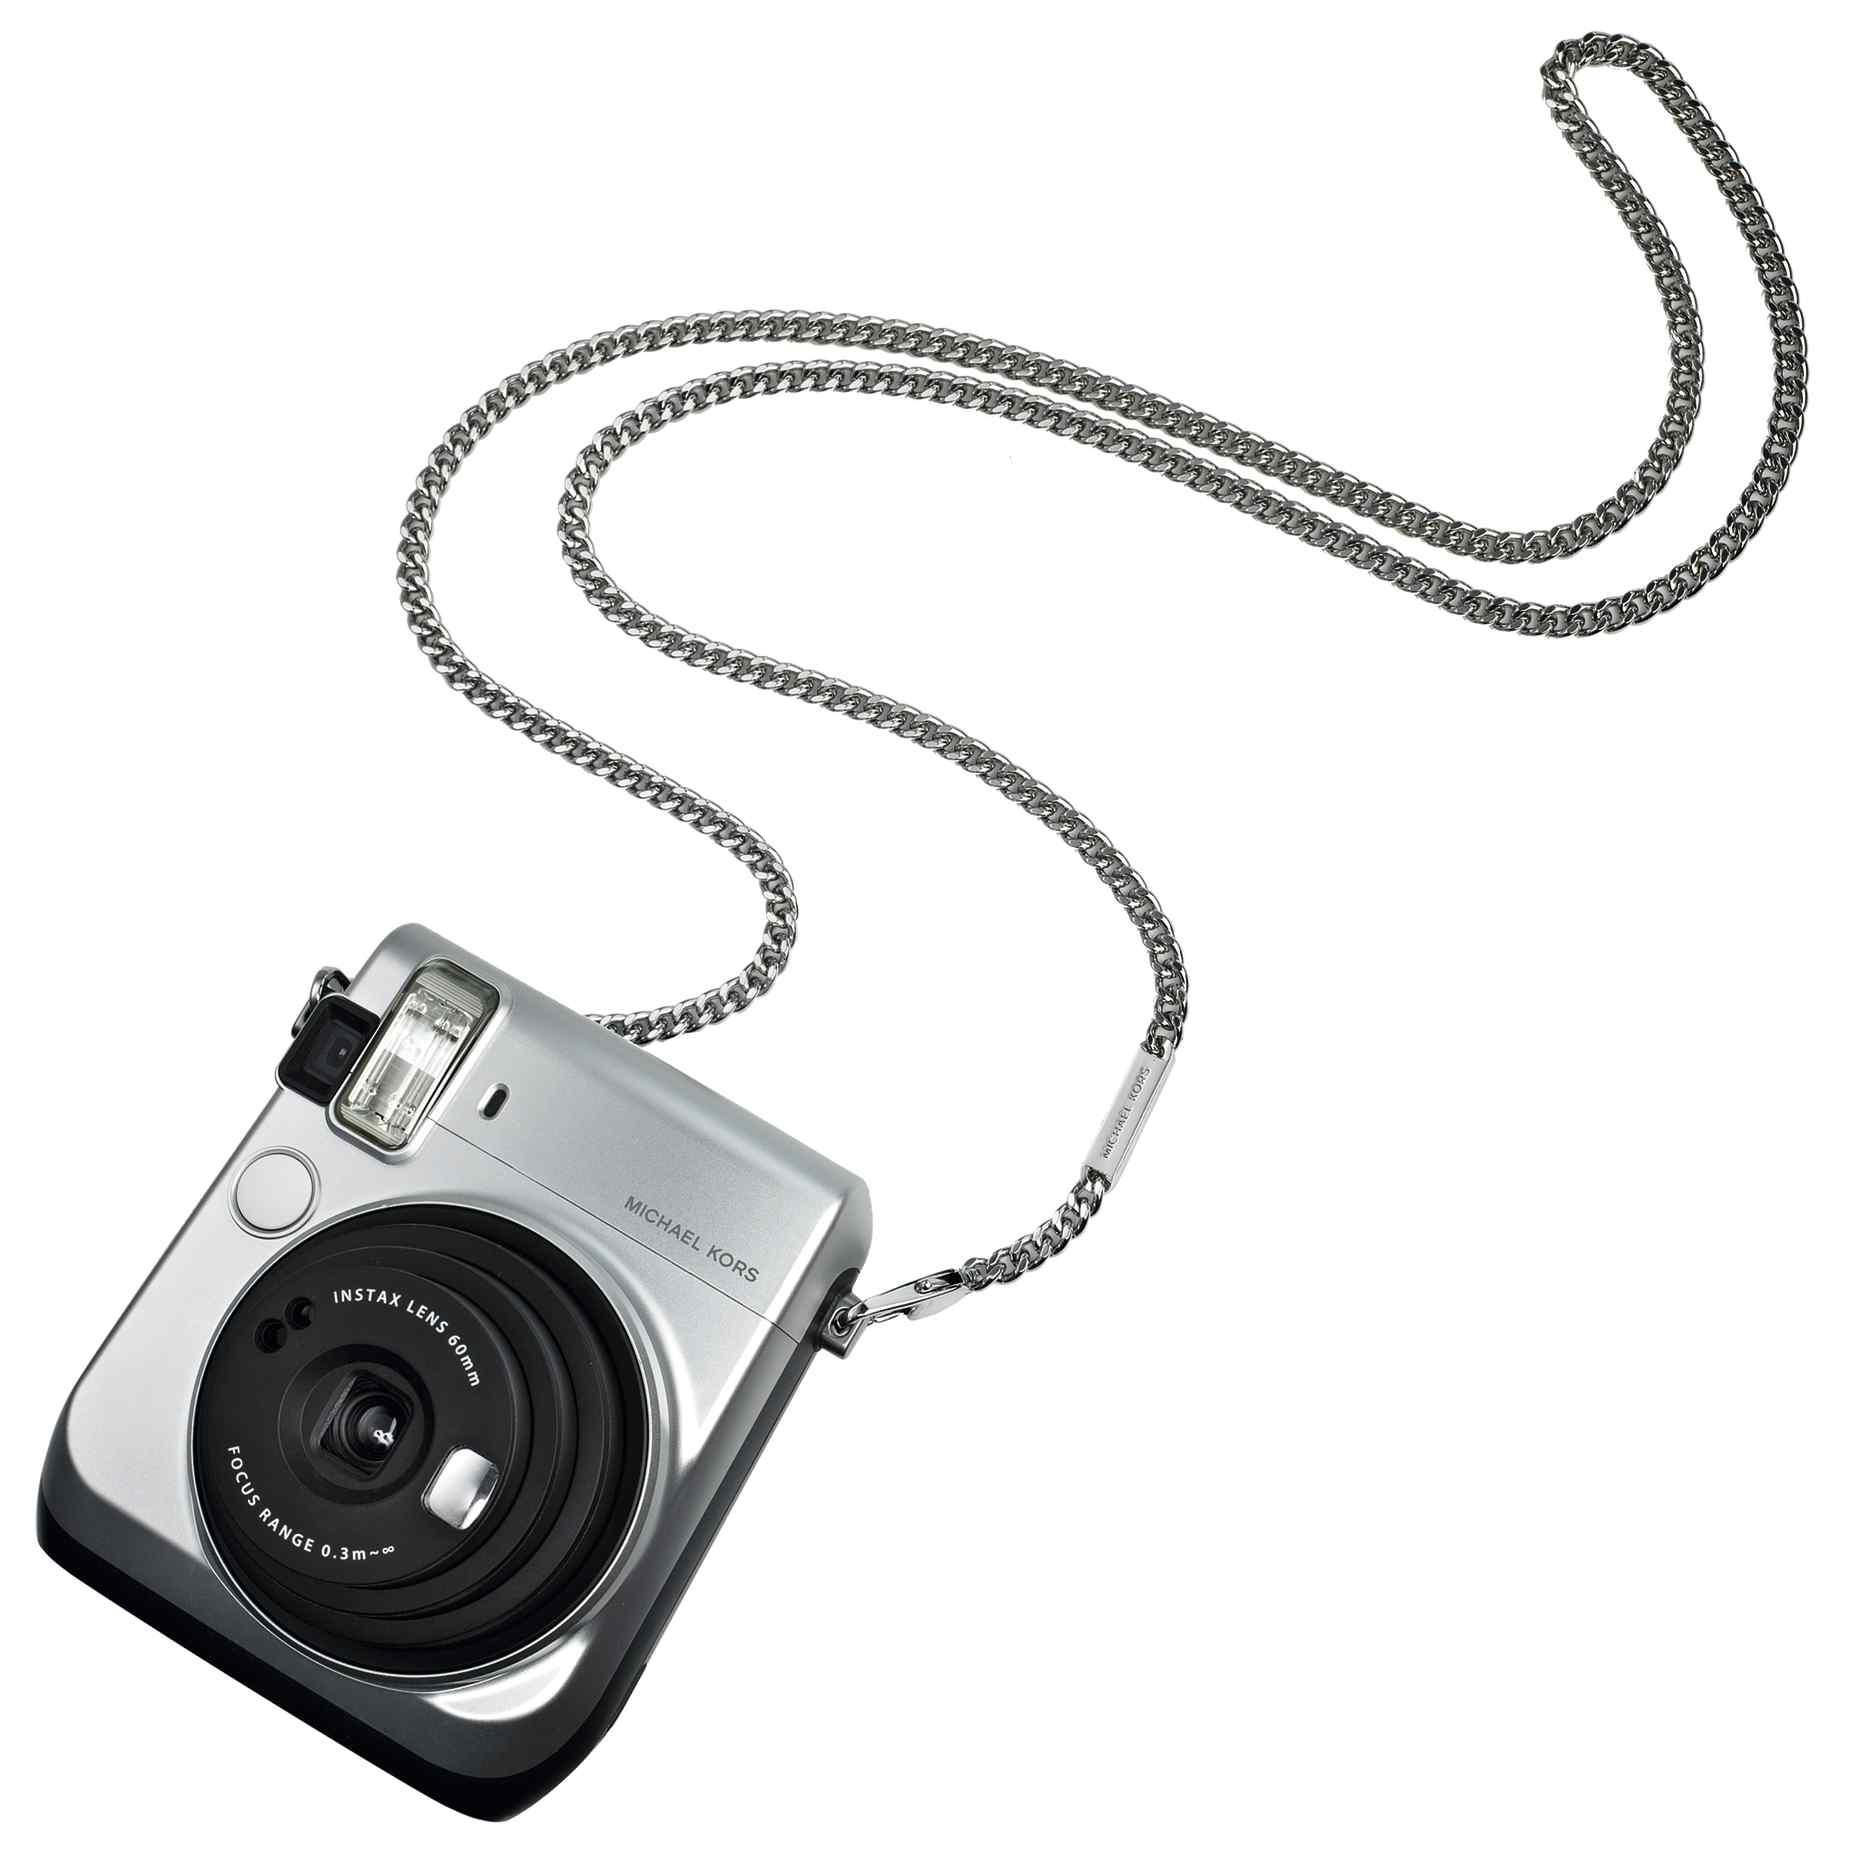 Michael kors camera